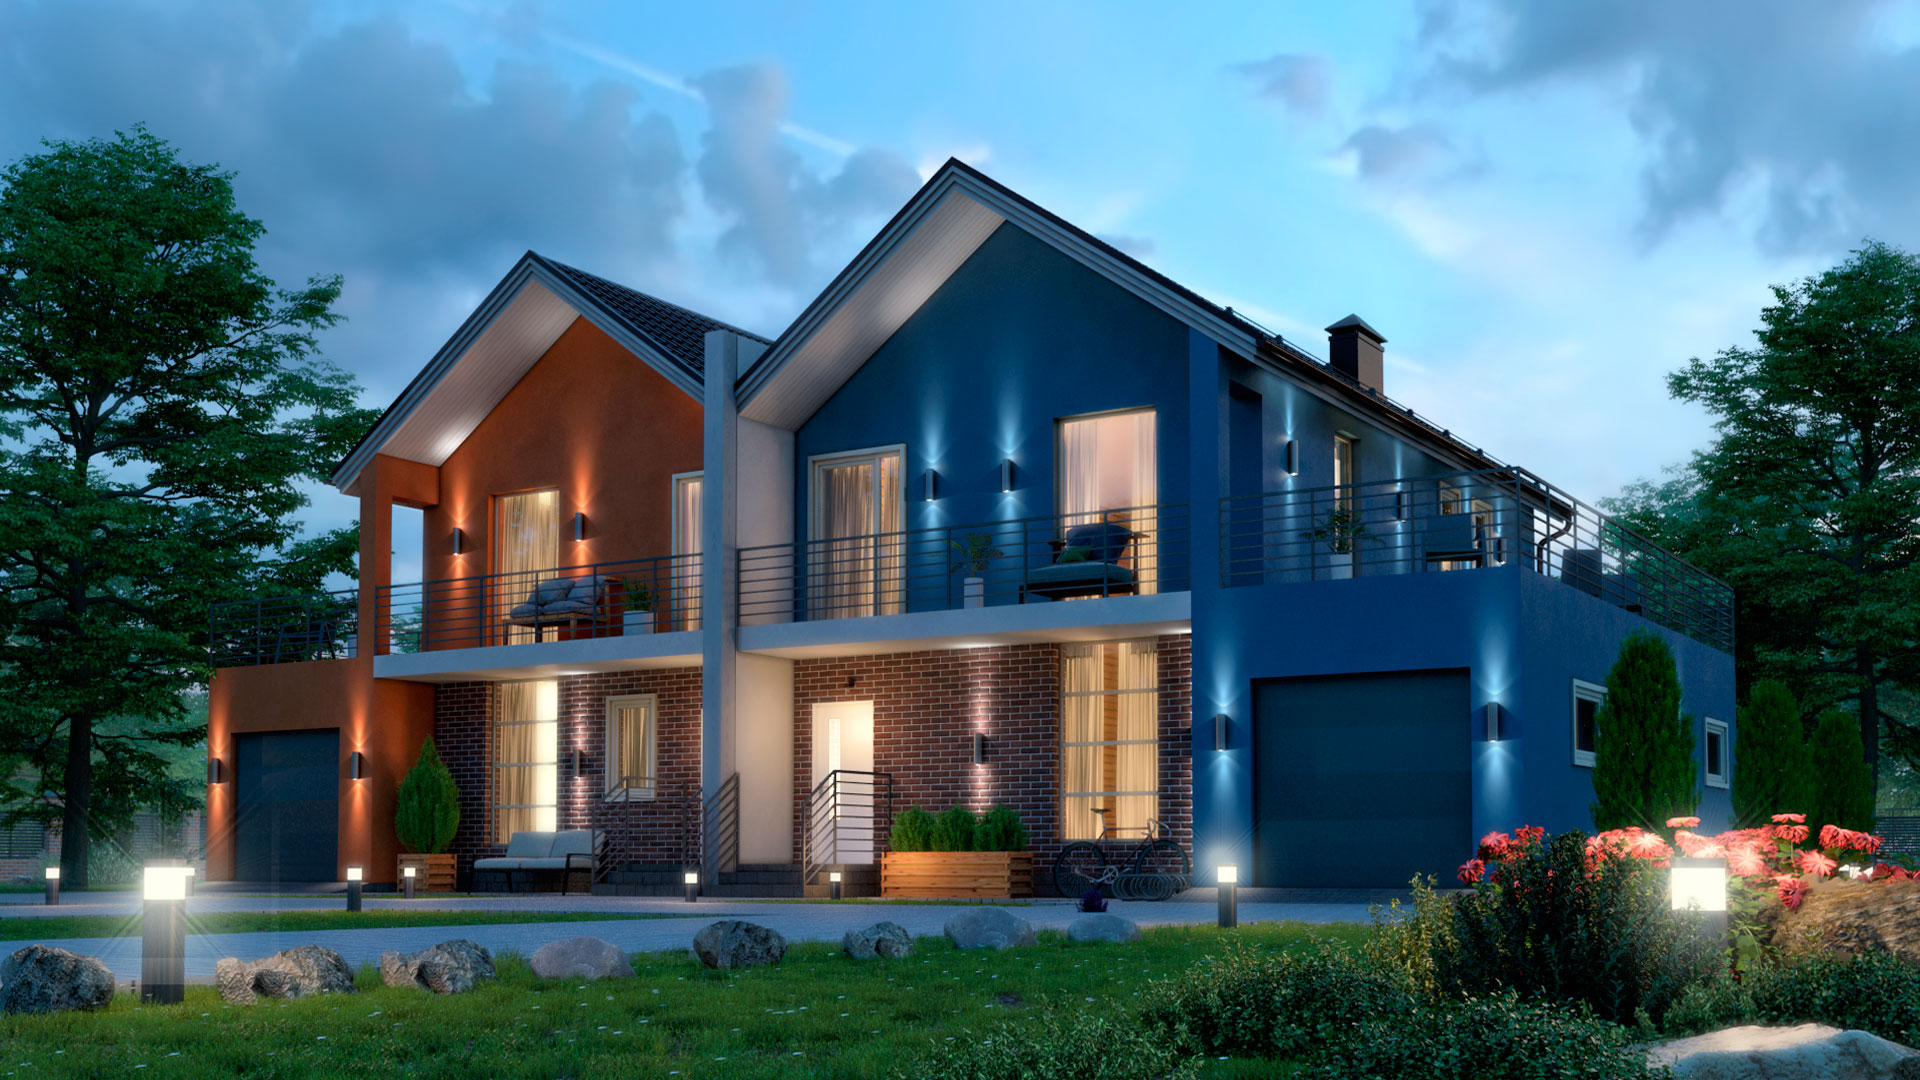 Фото двухэтажного дома с гаражами и террасами 195,35 м2, этажа 2, комнат 5, проект БЭНПАН-391.